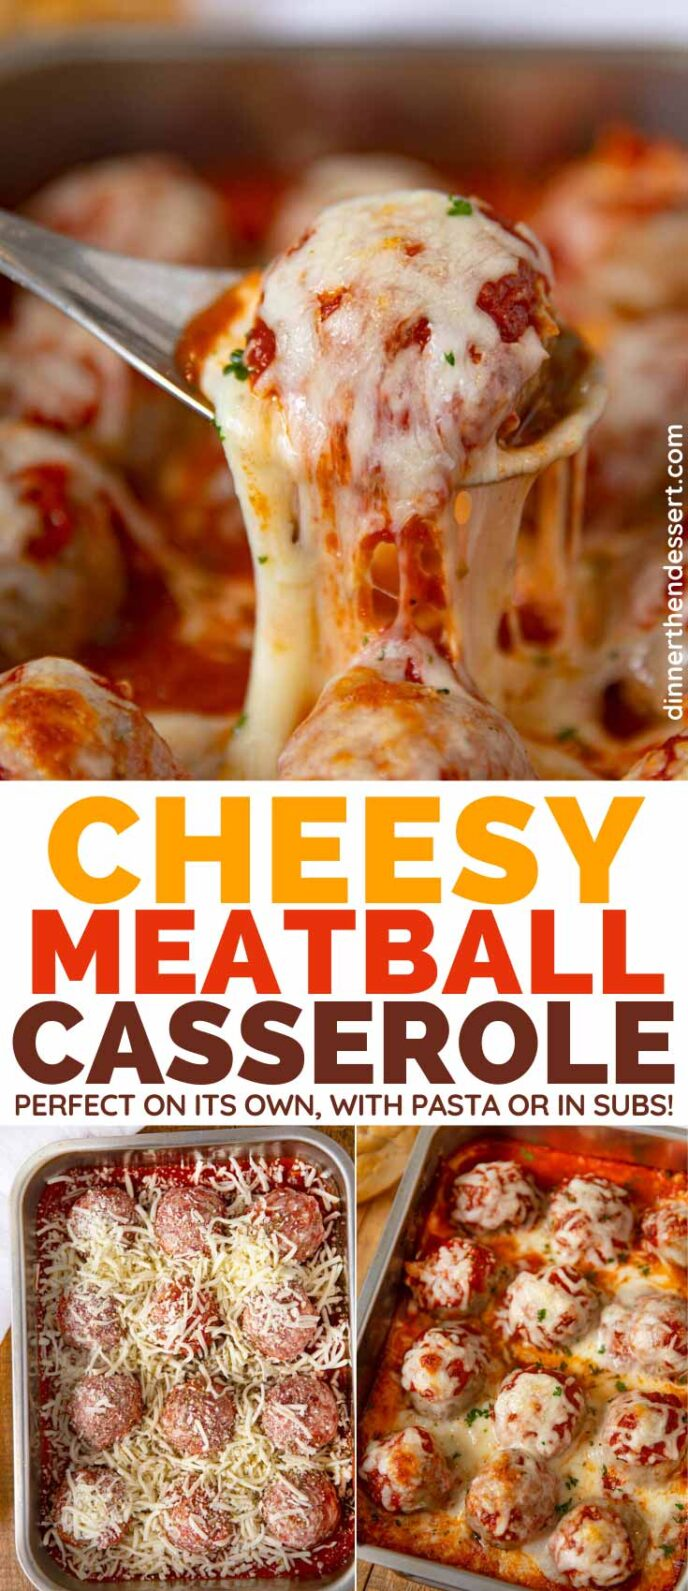 Cheesy Meatball Casserole collage